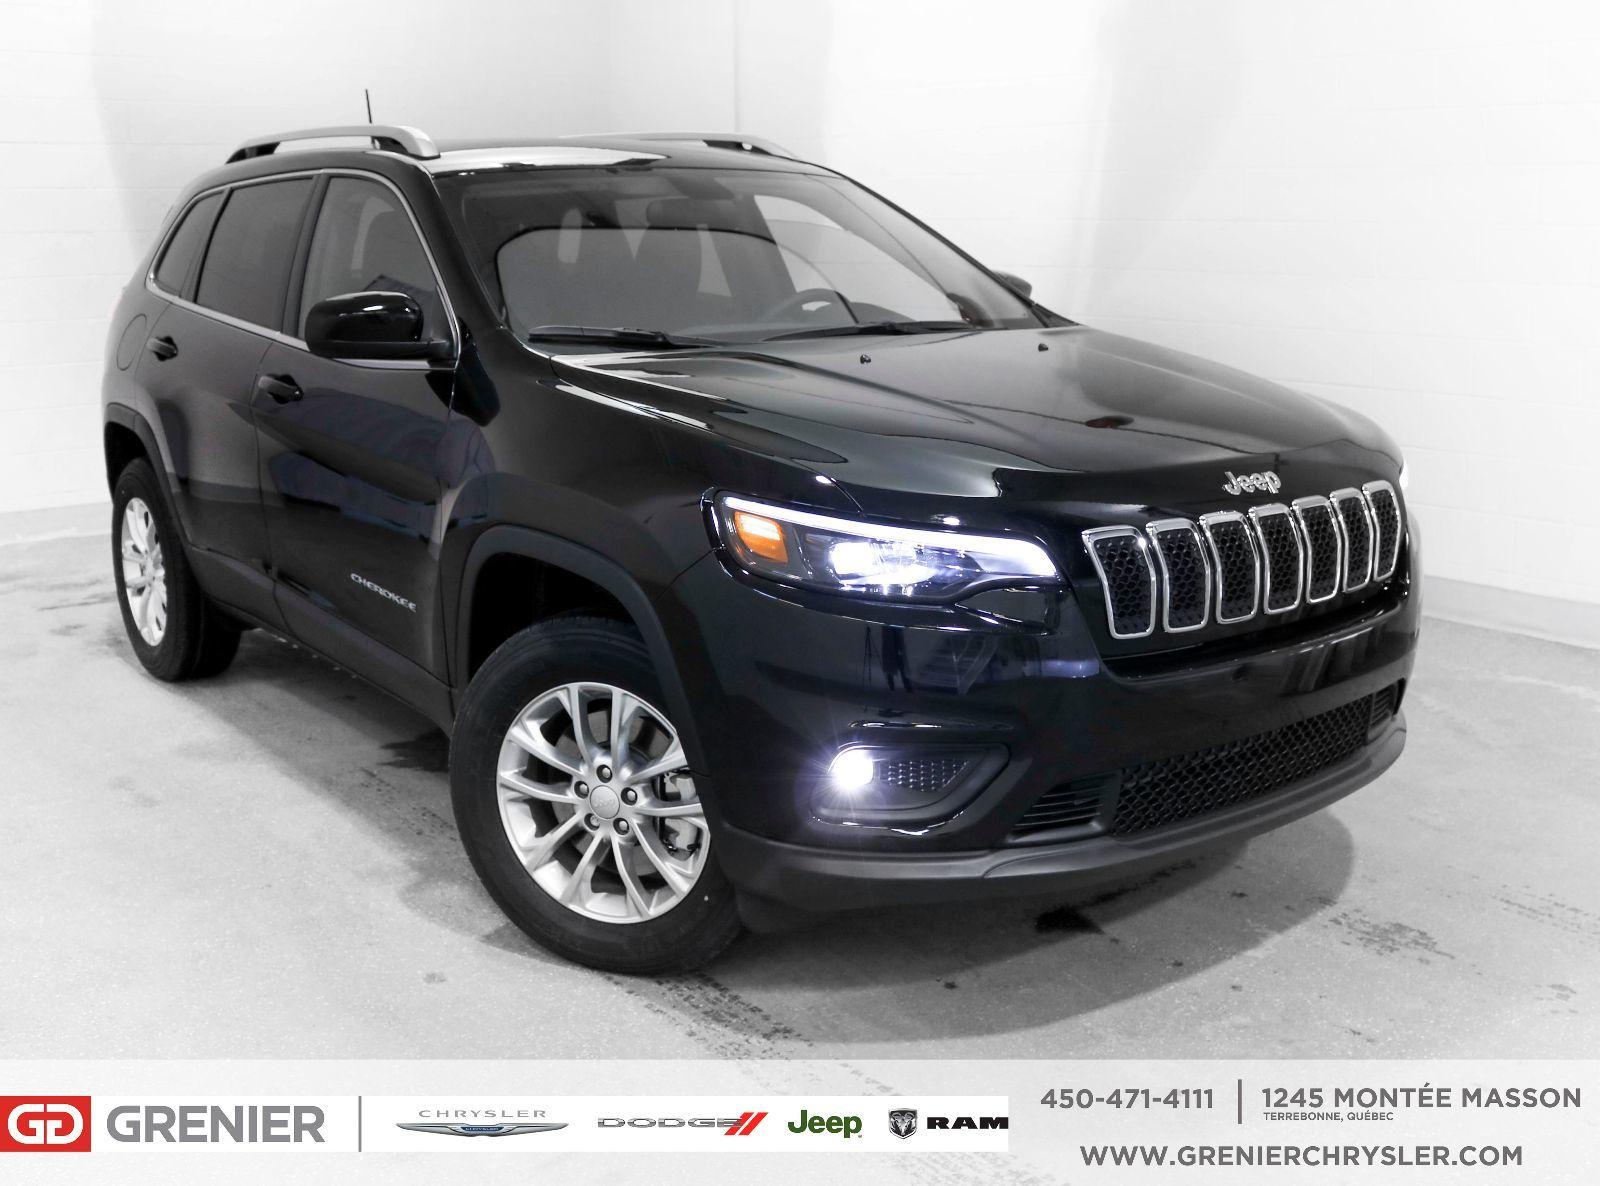 jeep cherokee nouveau mod le cherokee 2019 north 2019 neuf 35550 0 grenier automobile 106600. Black Bedroom Furniture Sets. Home Design Ideas